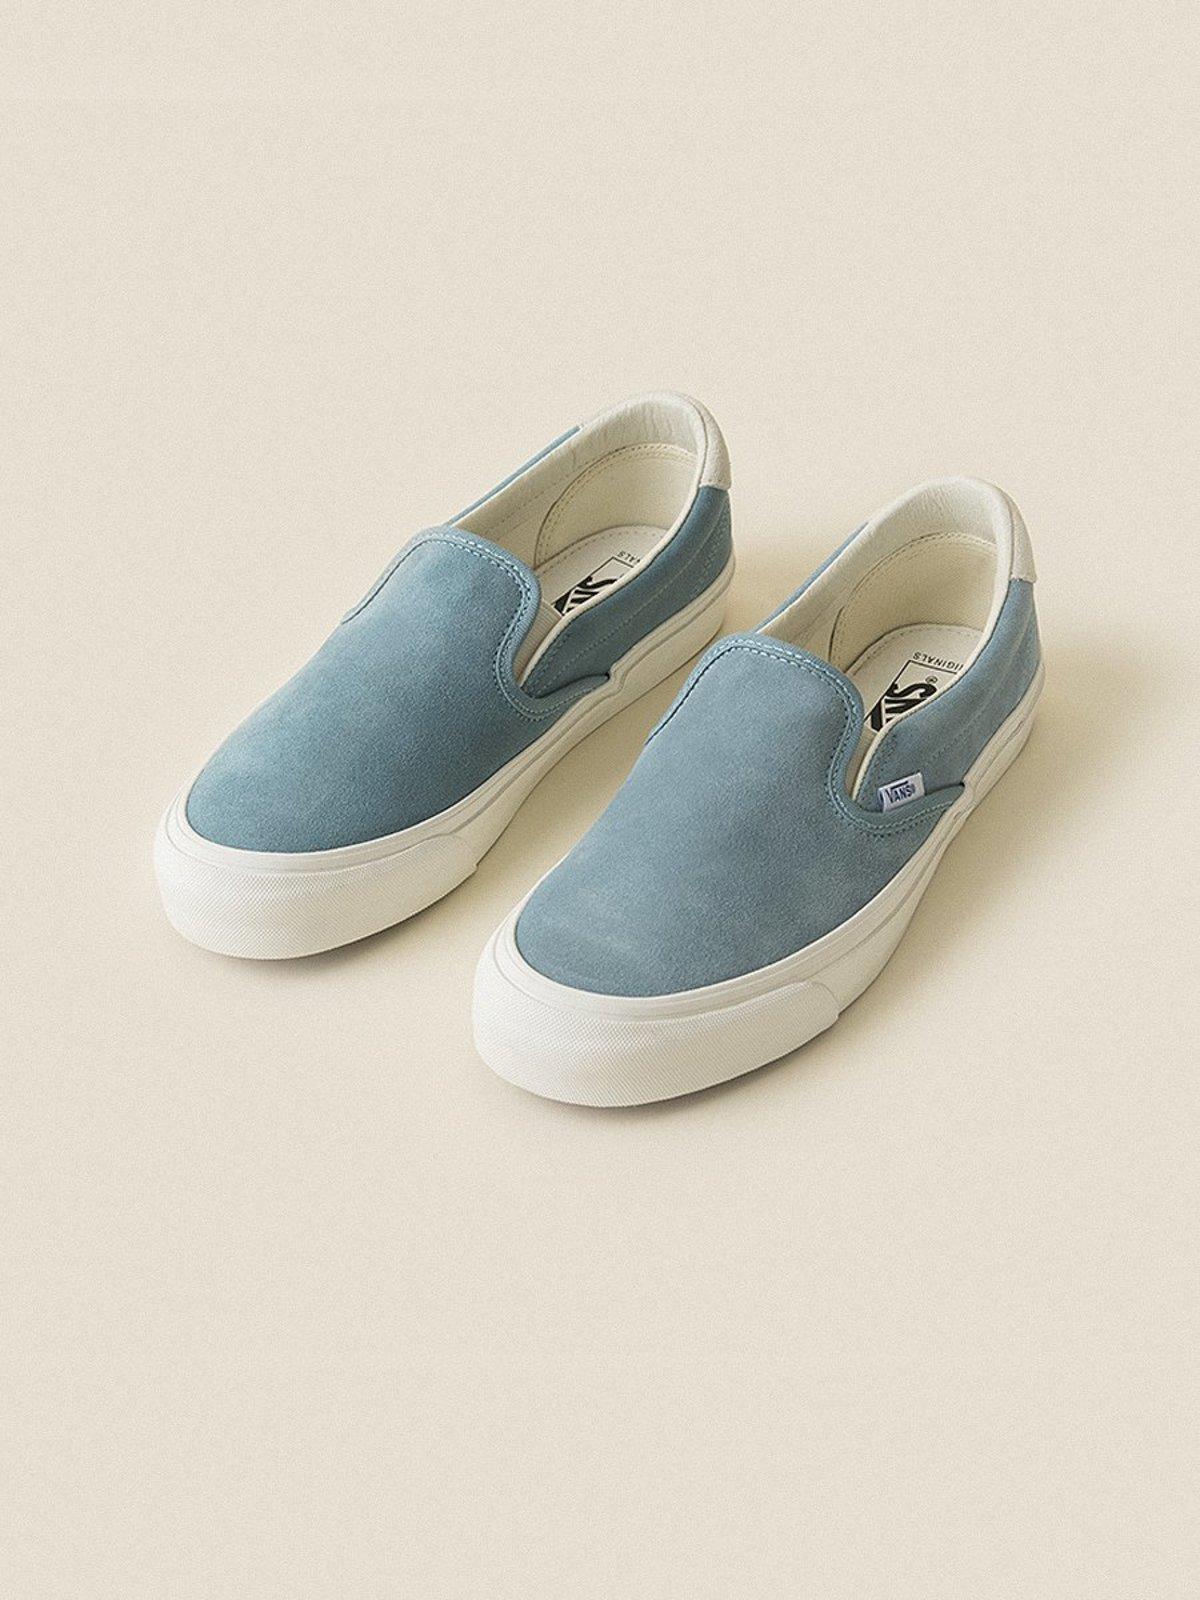 486aefc772a VANS VAULT Suede OG Slip-On 59 LX - Smoke Blue Marshmallow